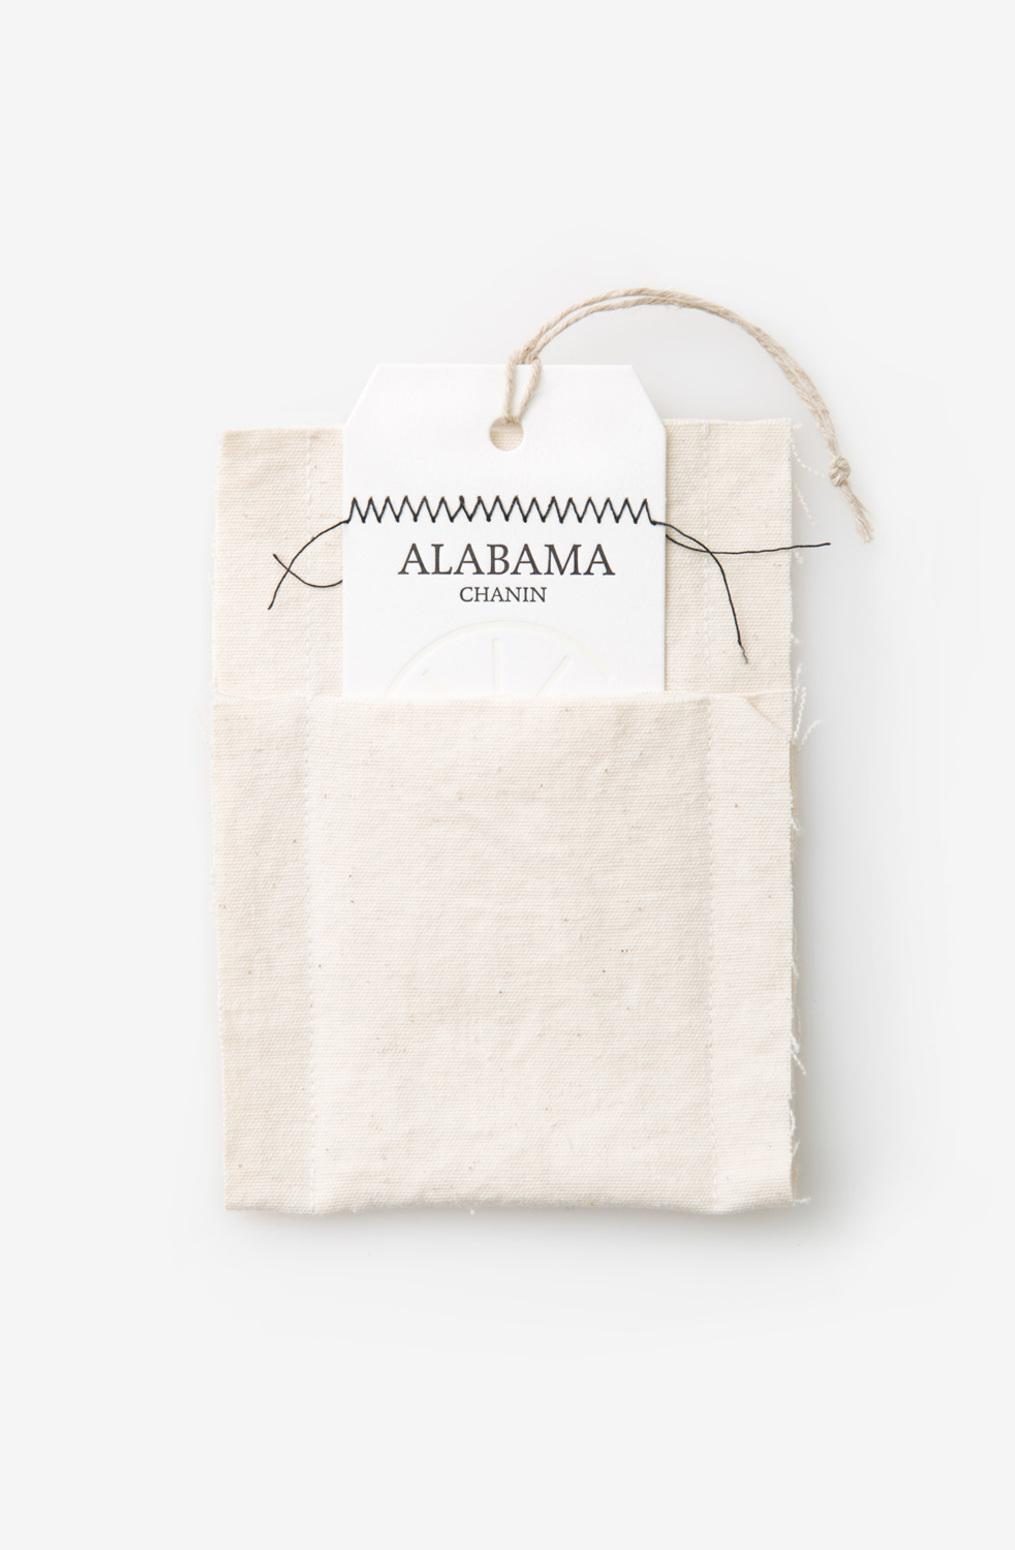 Alabama chanin gift certificate 1